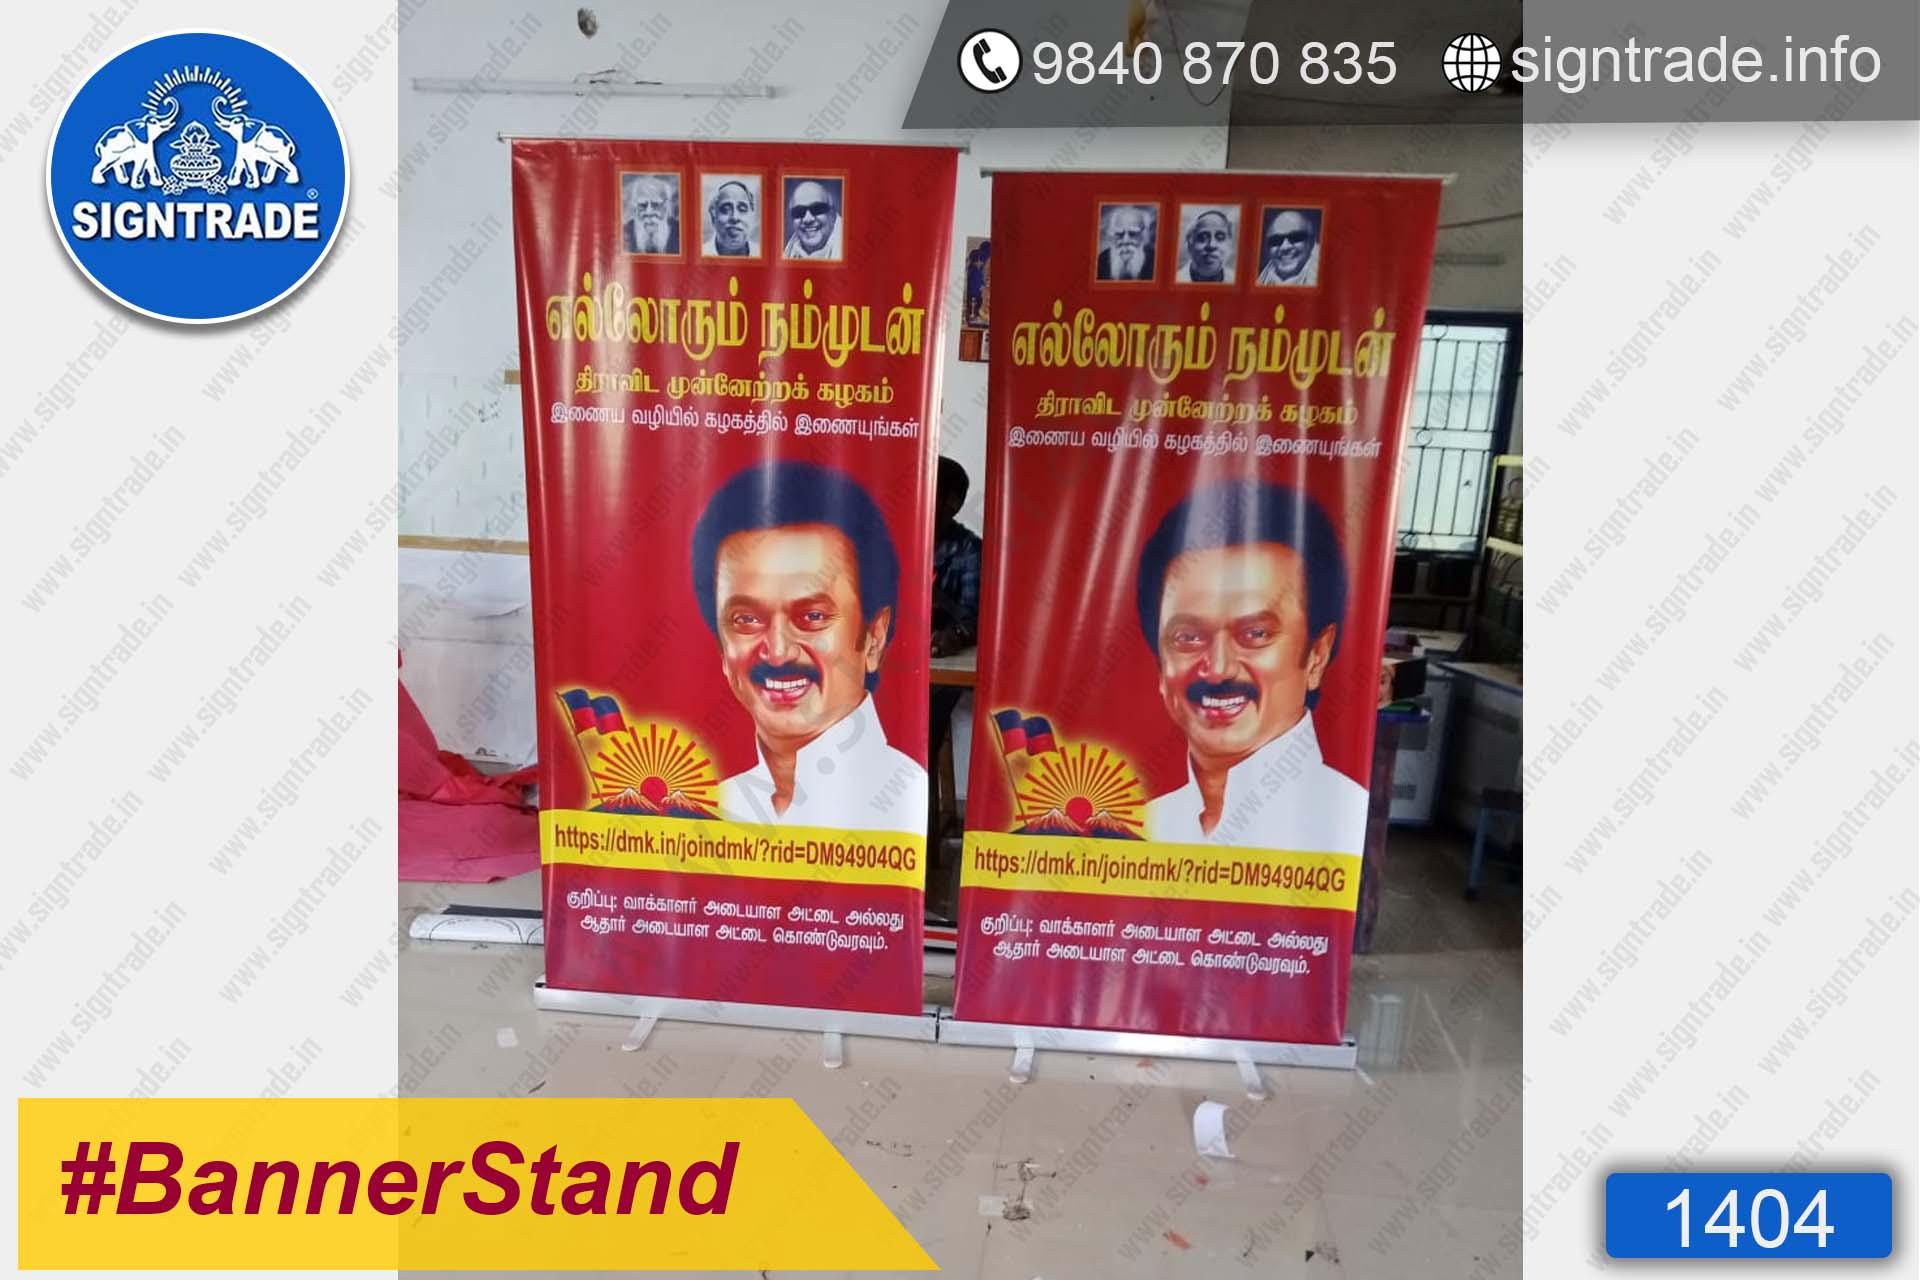 Dravida Munnetra Kazhagam - 1404, Retractable Banner, Roll Up Banner Stand, Banner Stand, Roll Up Banner, Standee, Promotional Standee, Promotional Roll Up Standee, Promo Standee